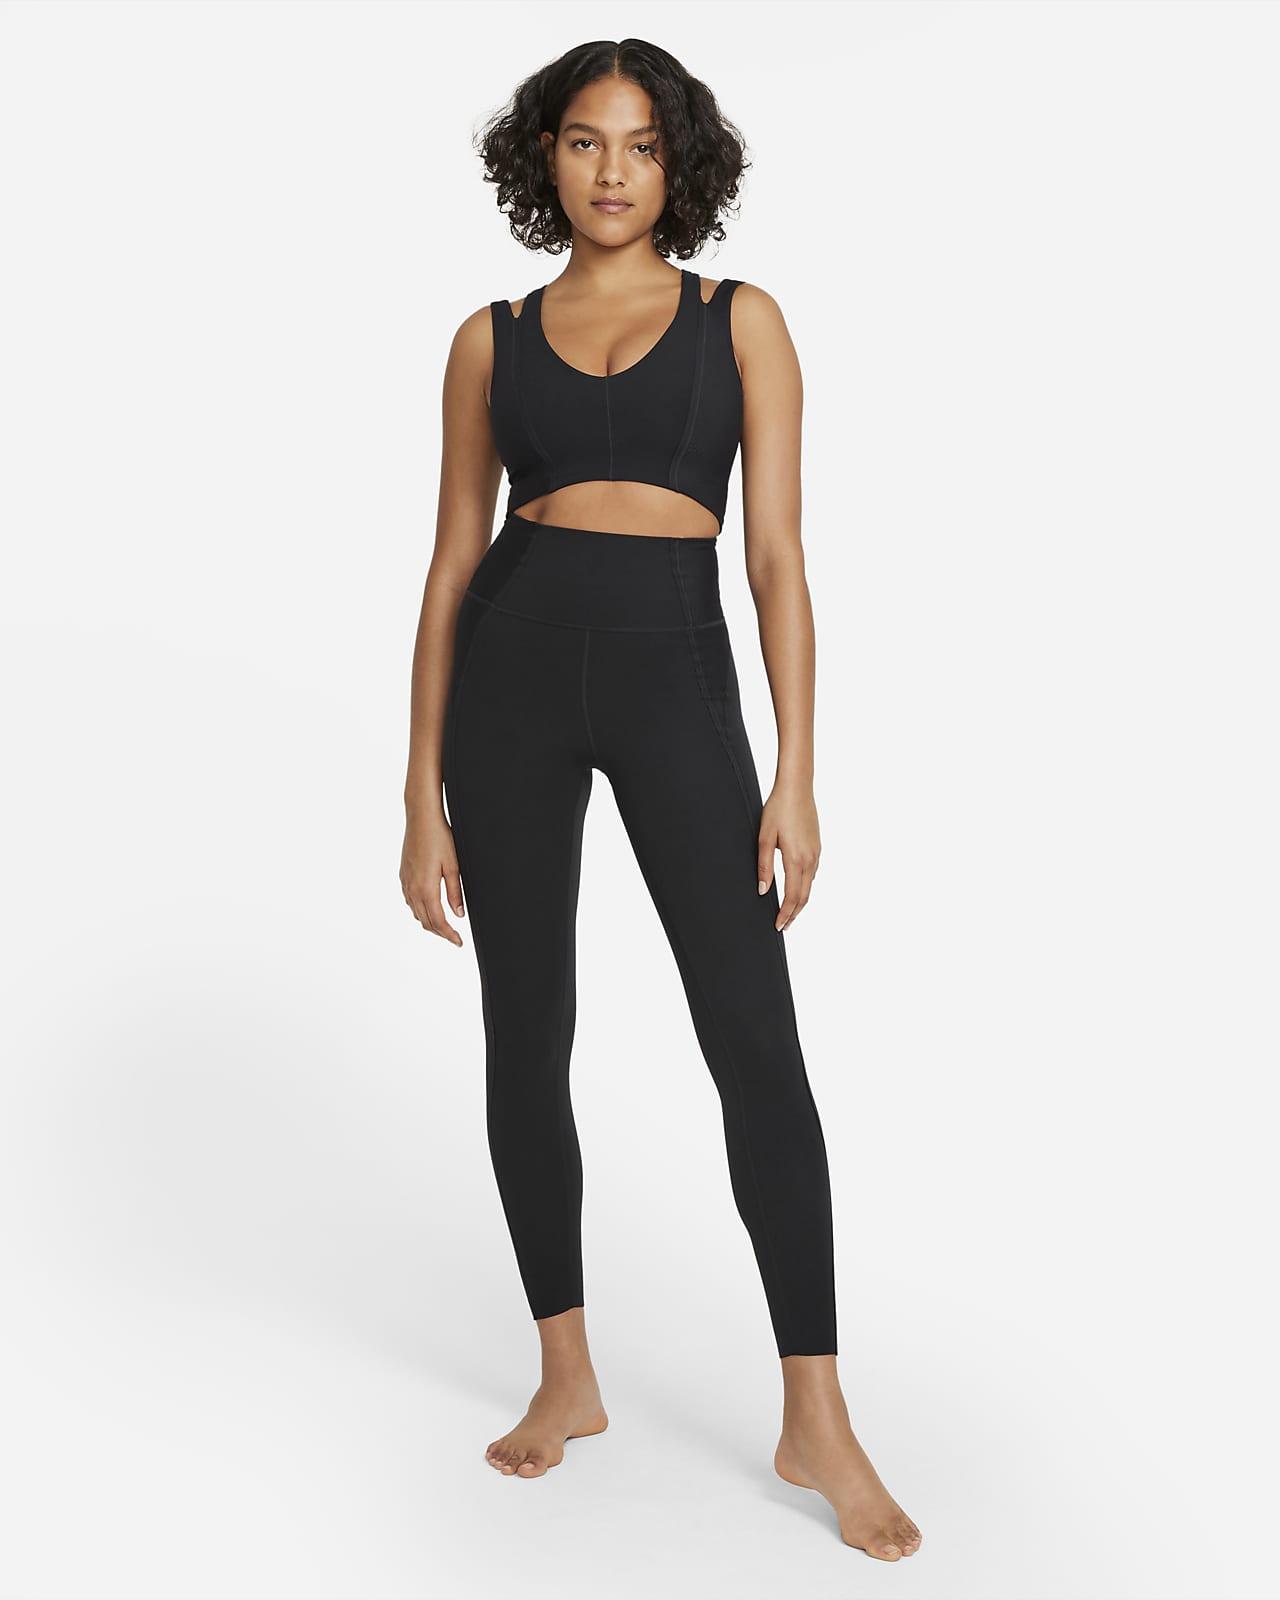 Nike Yoga Luxe Dri-FIT Women's Infinalon Jumpsuit